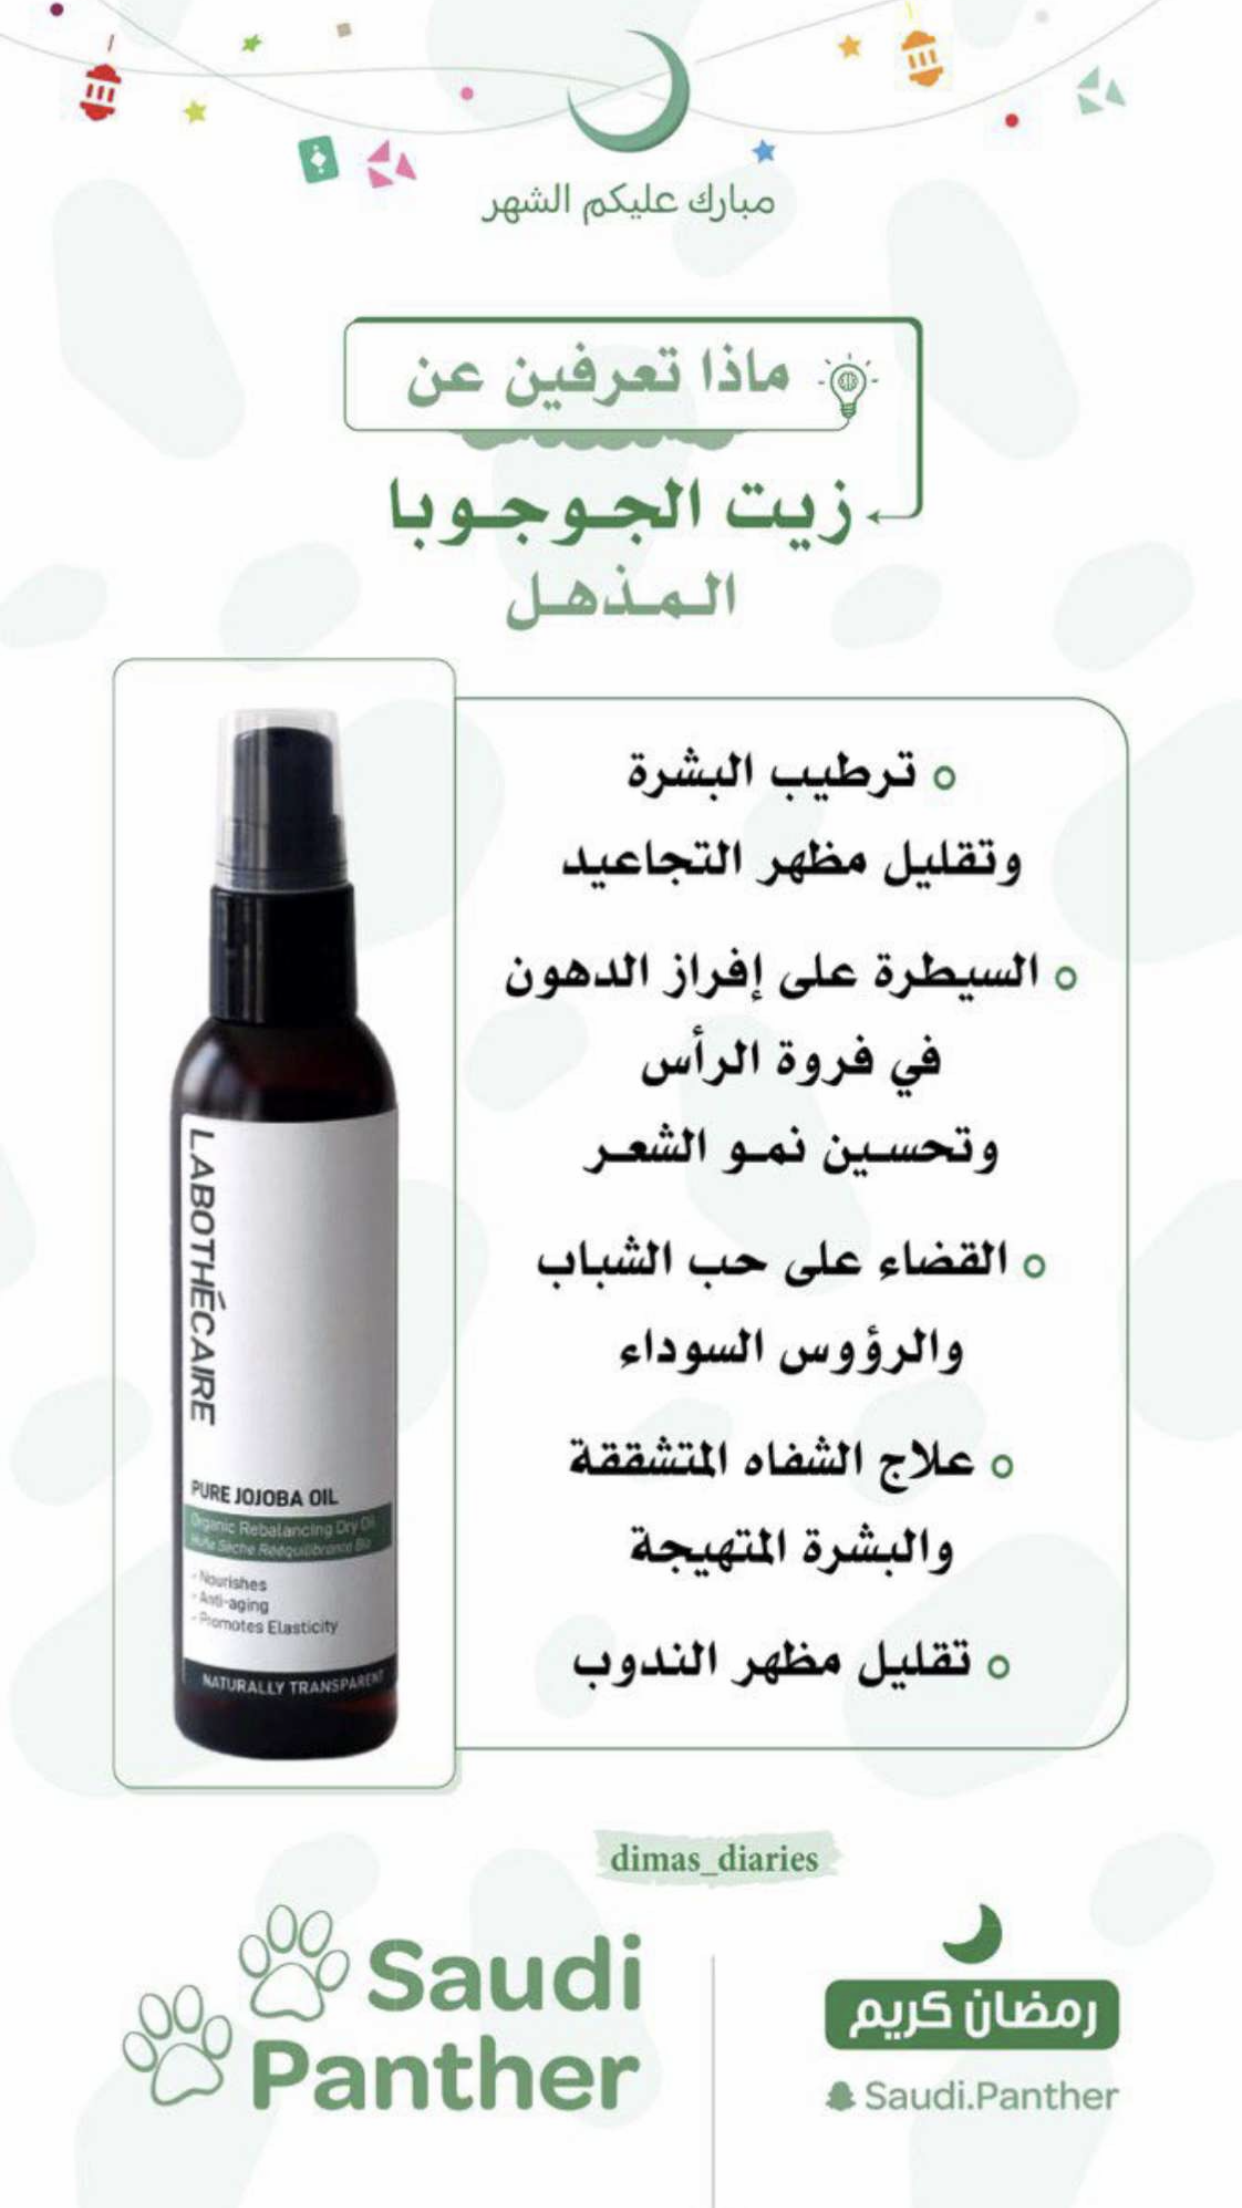 فوائد زيت الجوجوبا Hair Care Oils Beauty Skin Care Routine Skin Care Mask